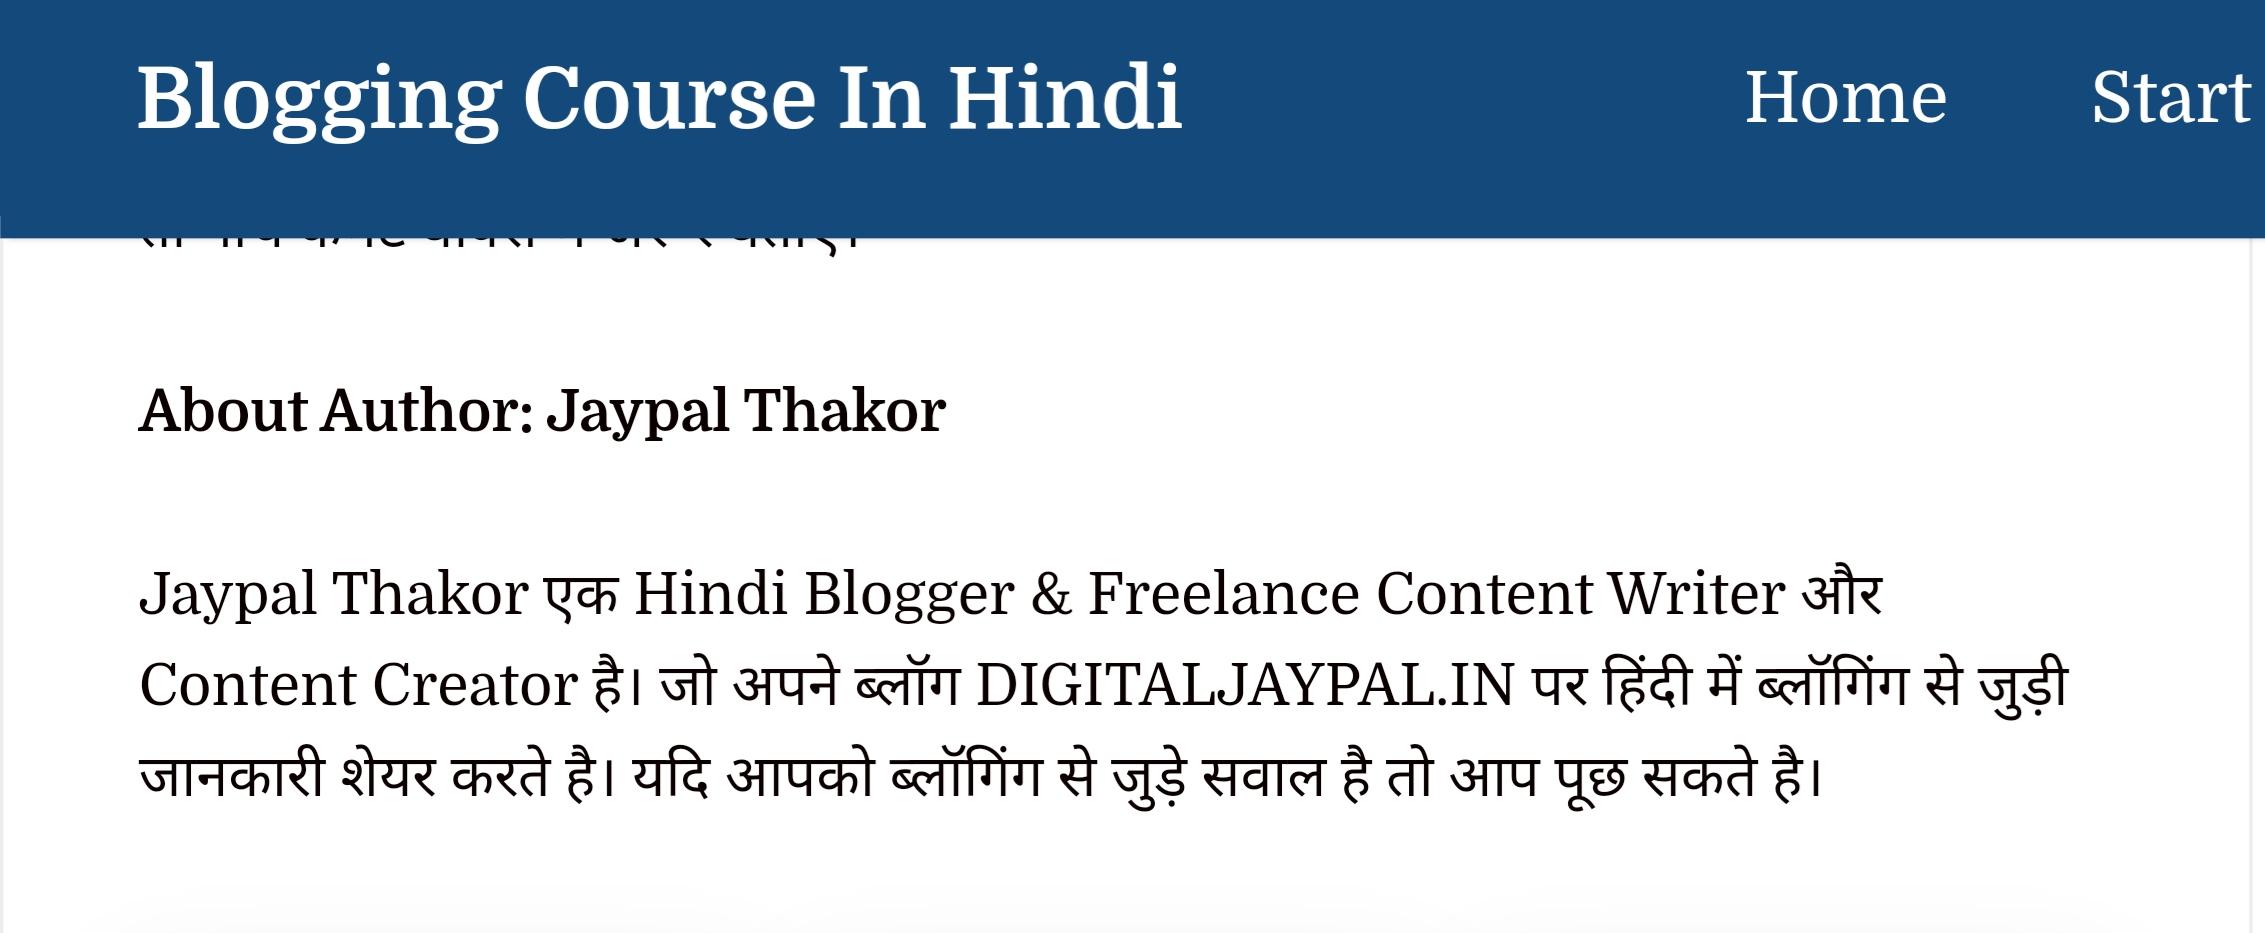 Digital jaypal author box